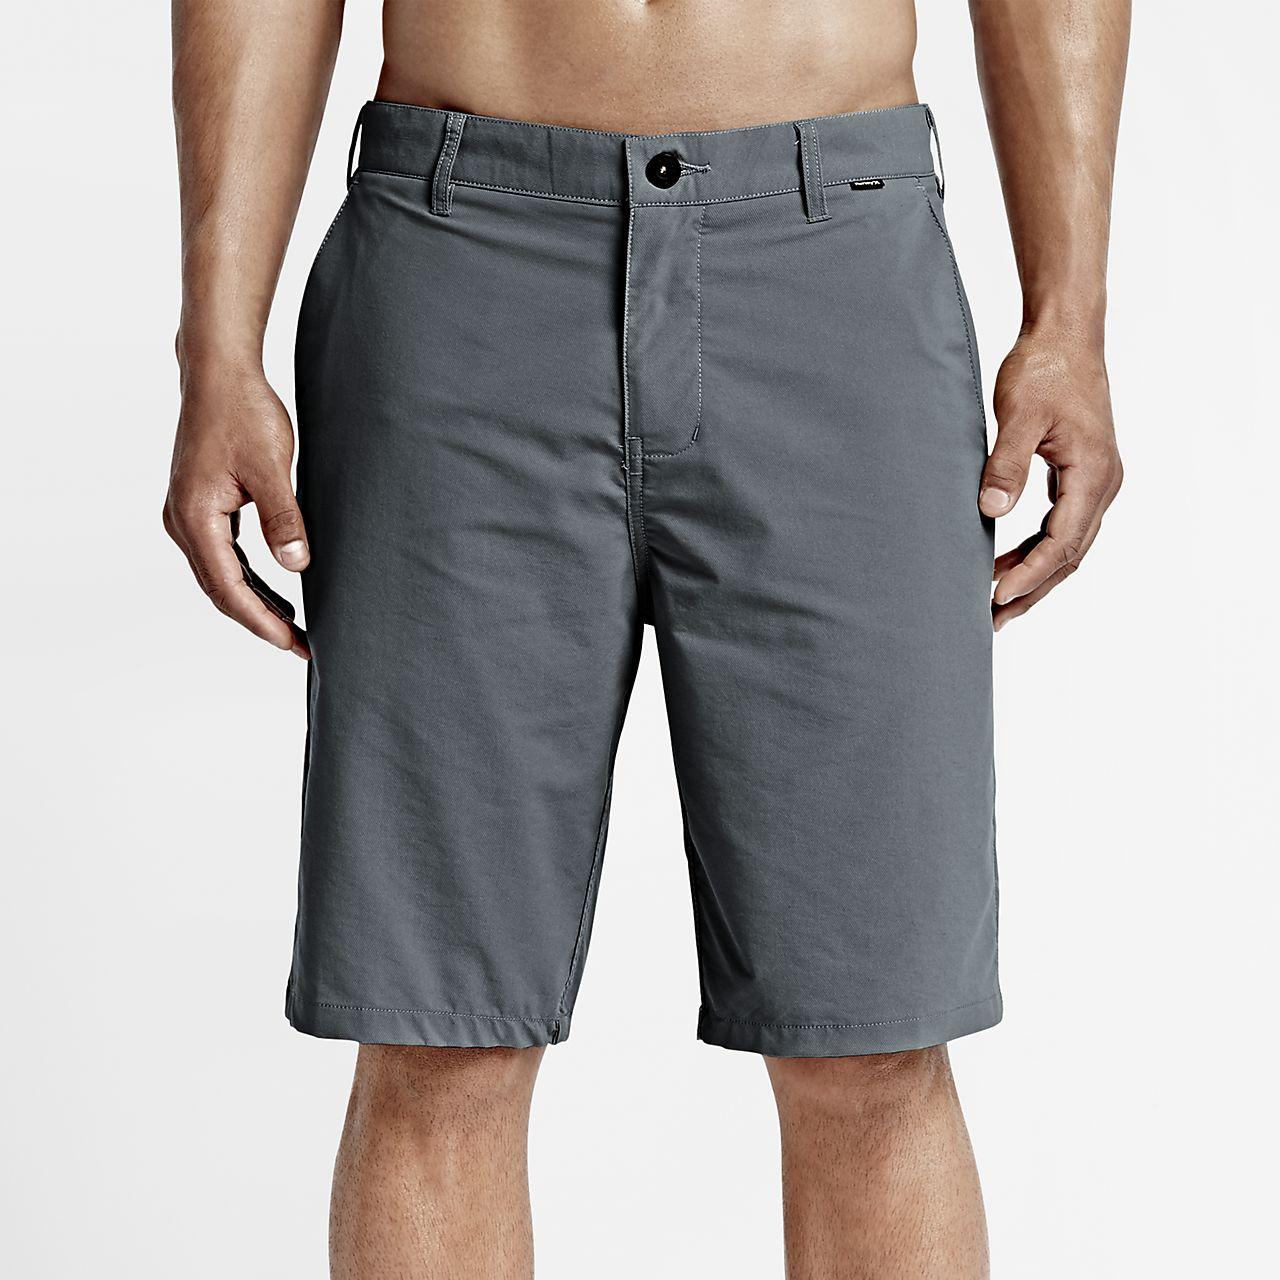 "Hurley Dri-FIT Chino Men's 21"" Shorts"